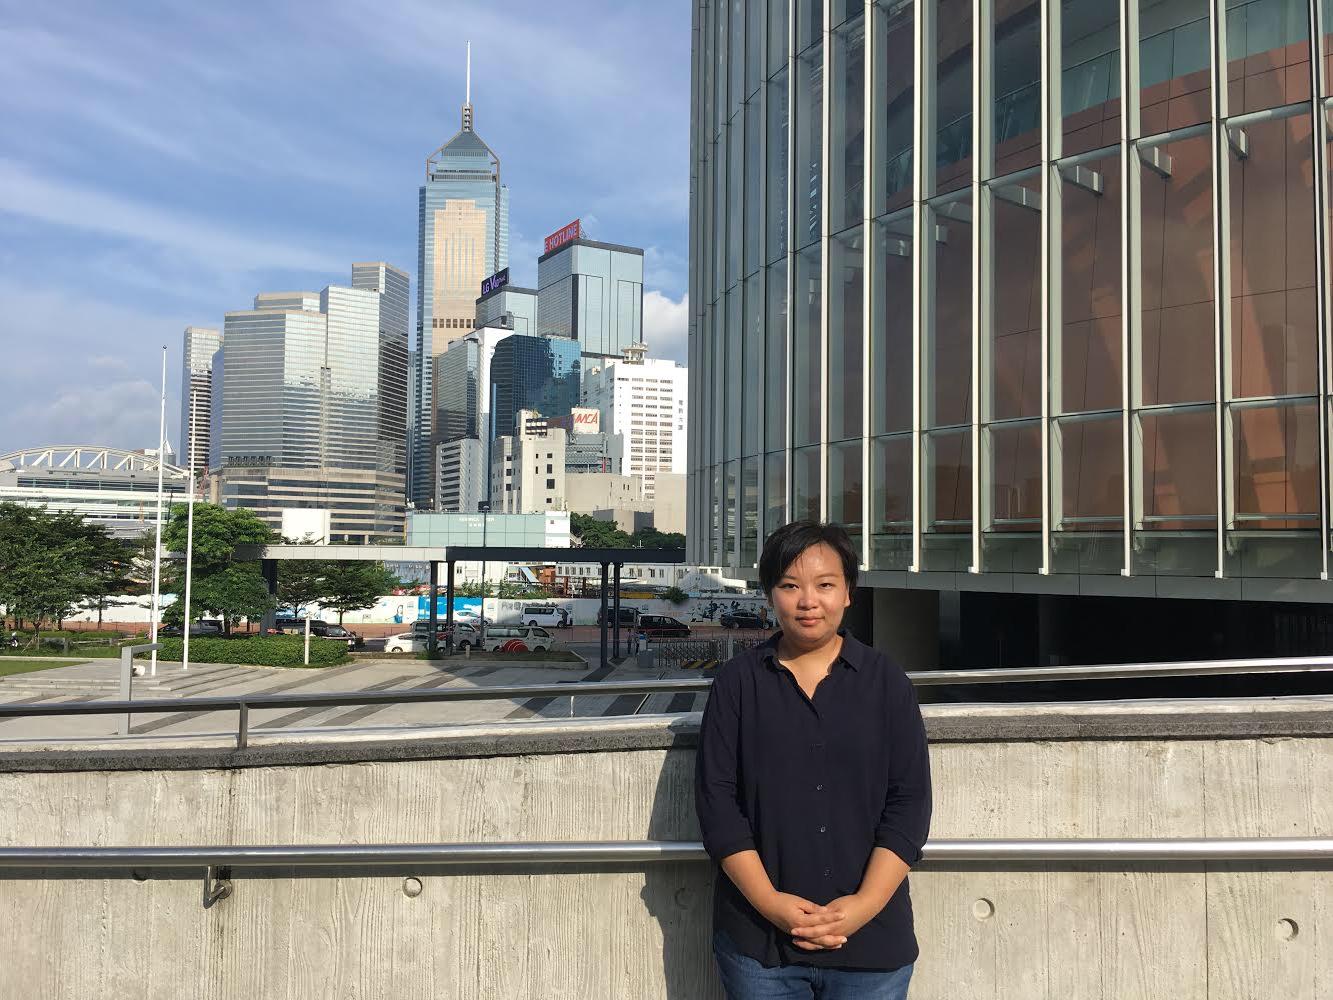 L'Occidente fermi il bullismo cinese a Hong Kong. L'appello di Bonnie Leung